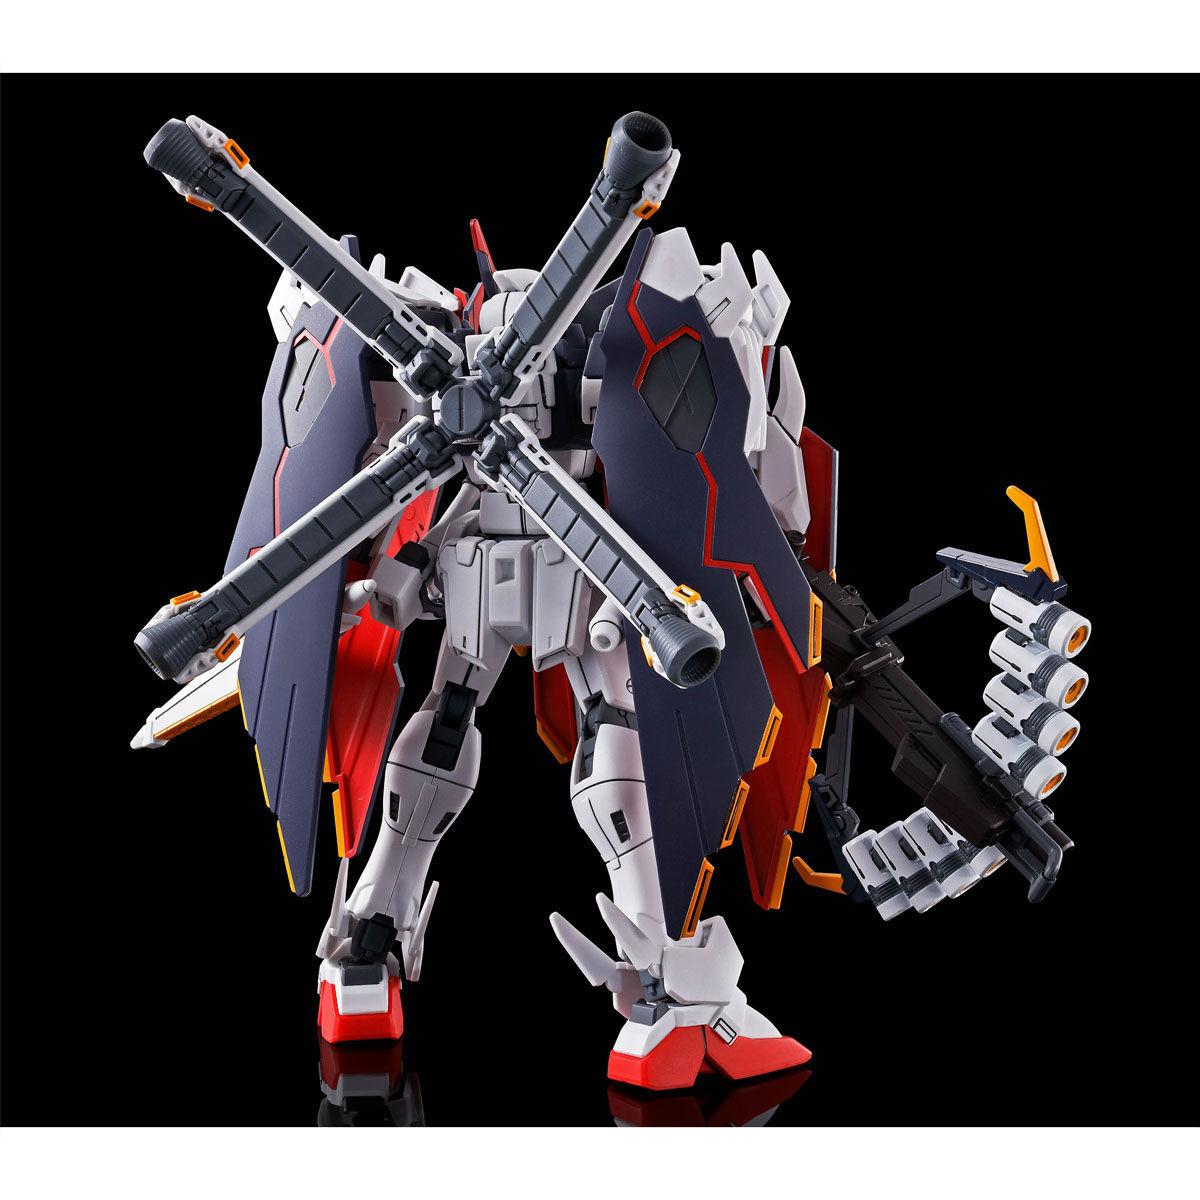 HG クロスボーン・ガンダムX1フルクロス05